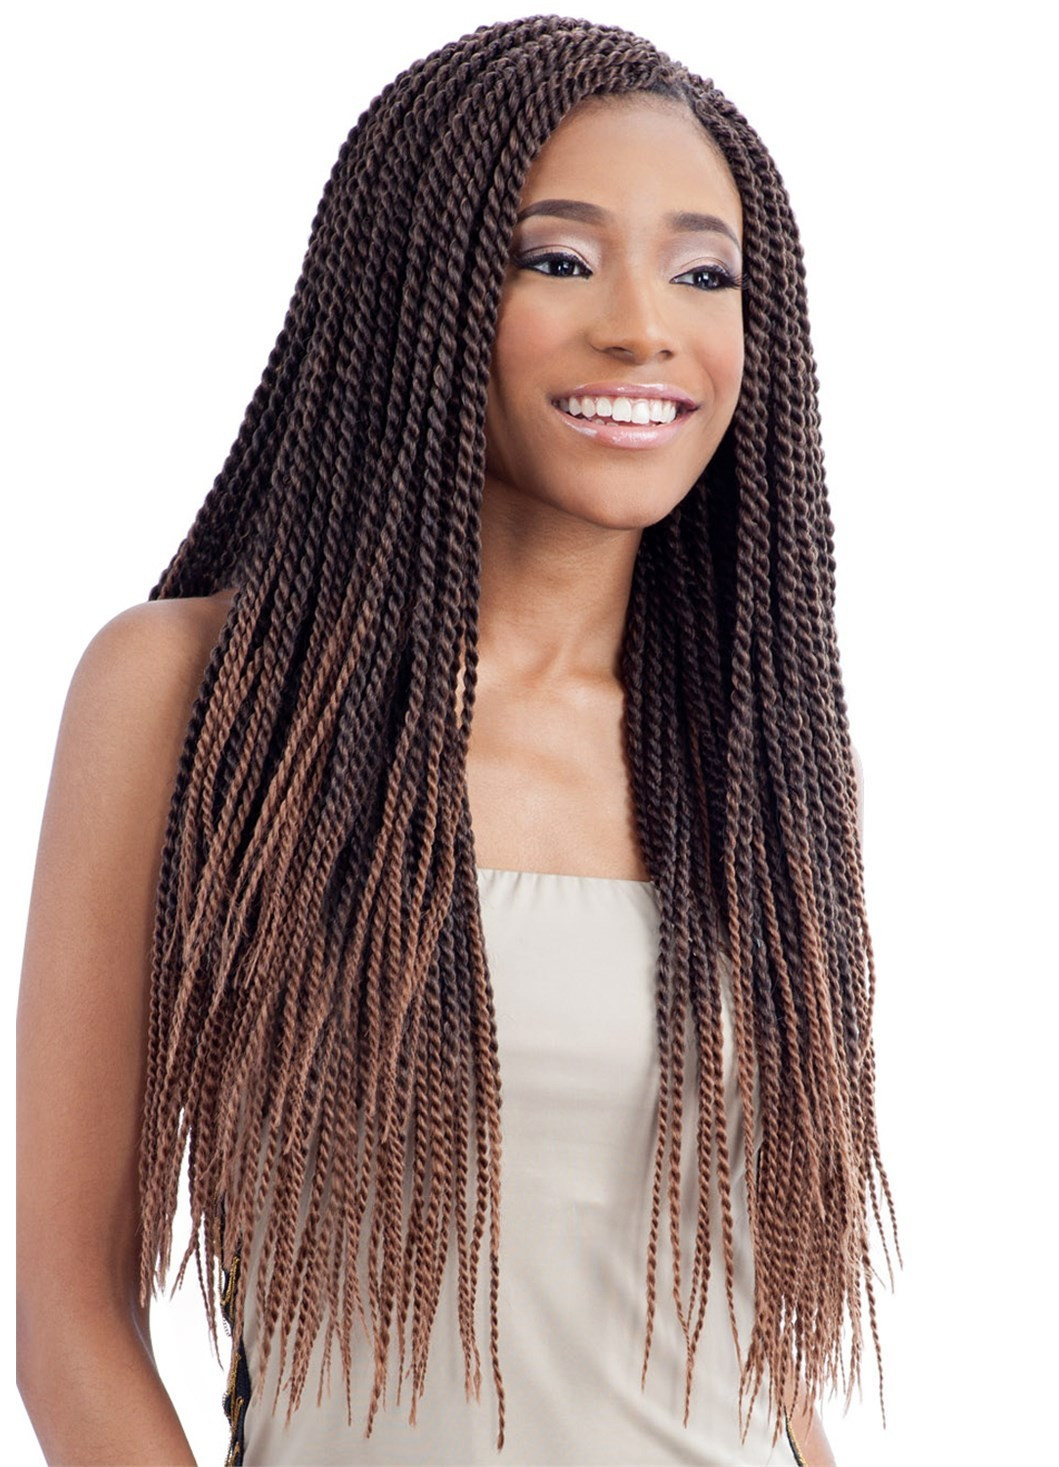 Senegalese Twist Crochet Hairstyles  Model Model Glance Crochet Braid SENEGALESE TWIST SMALL